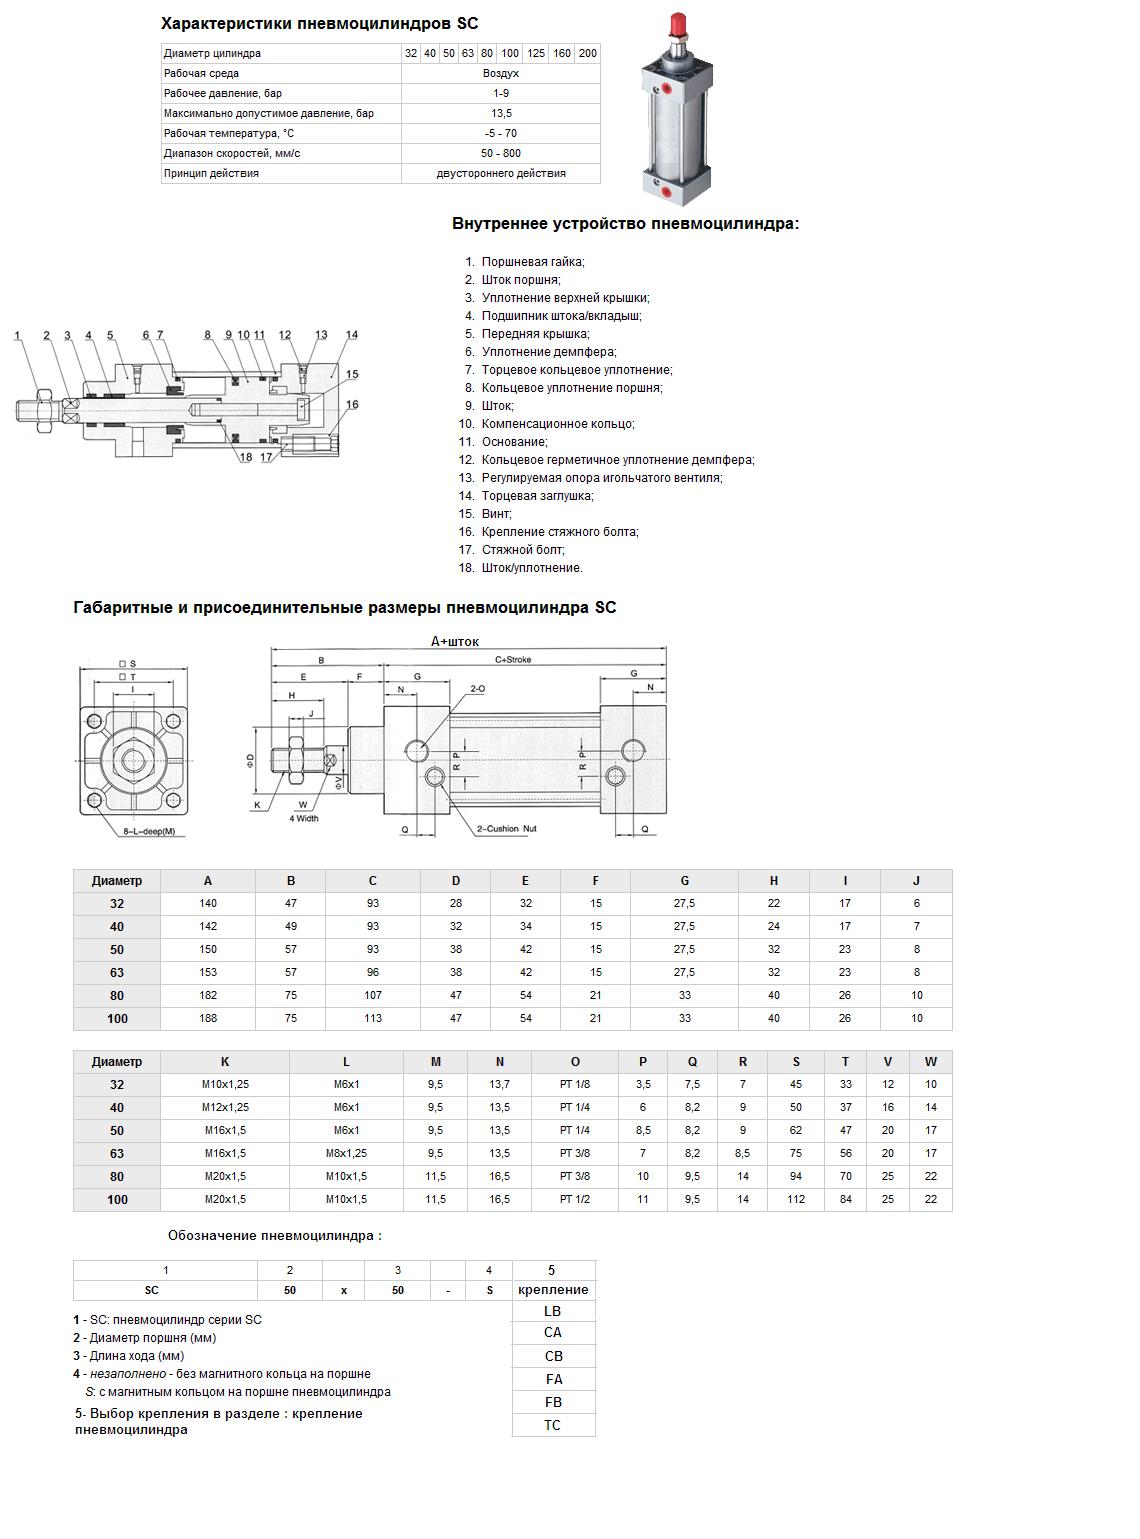 Пневмоцилиндр SC